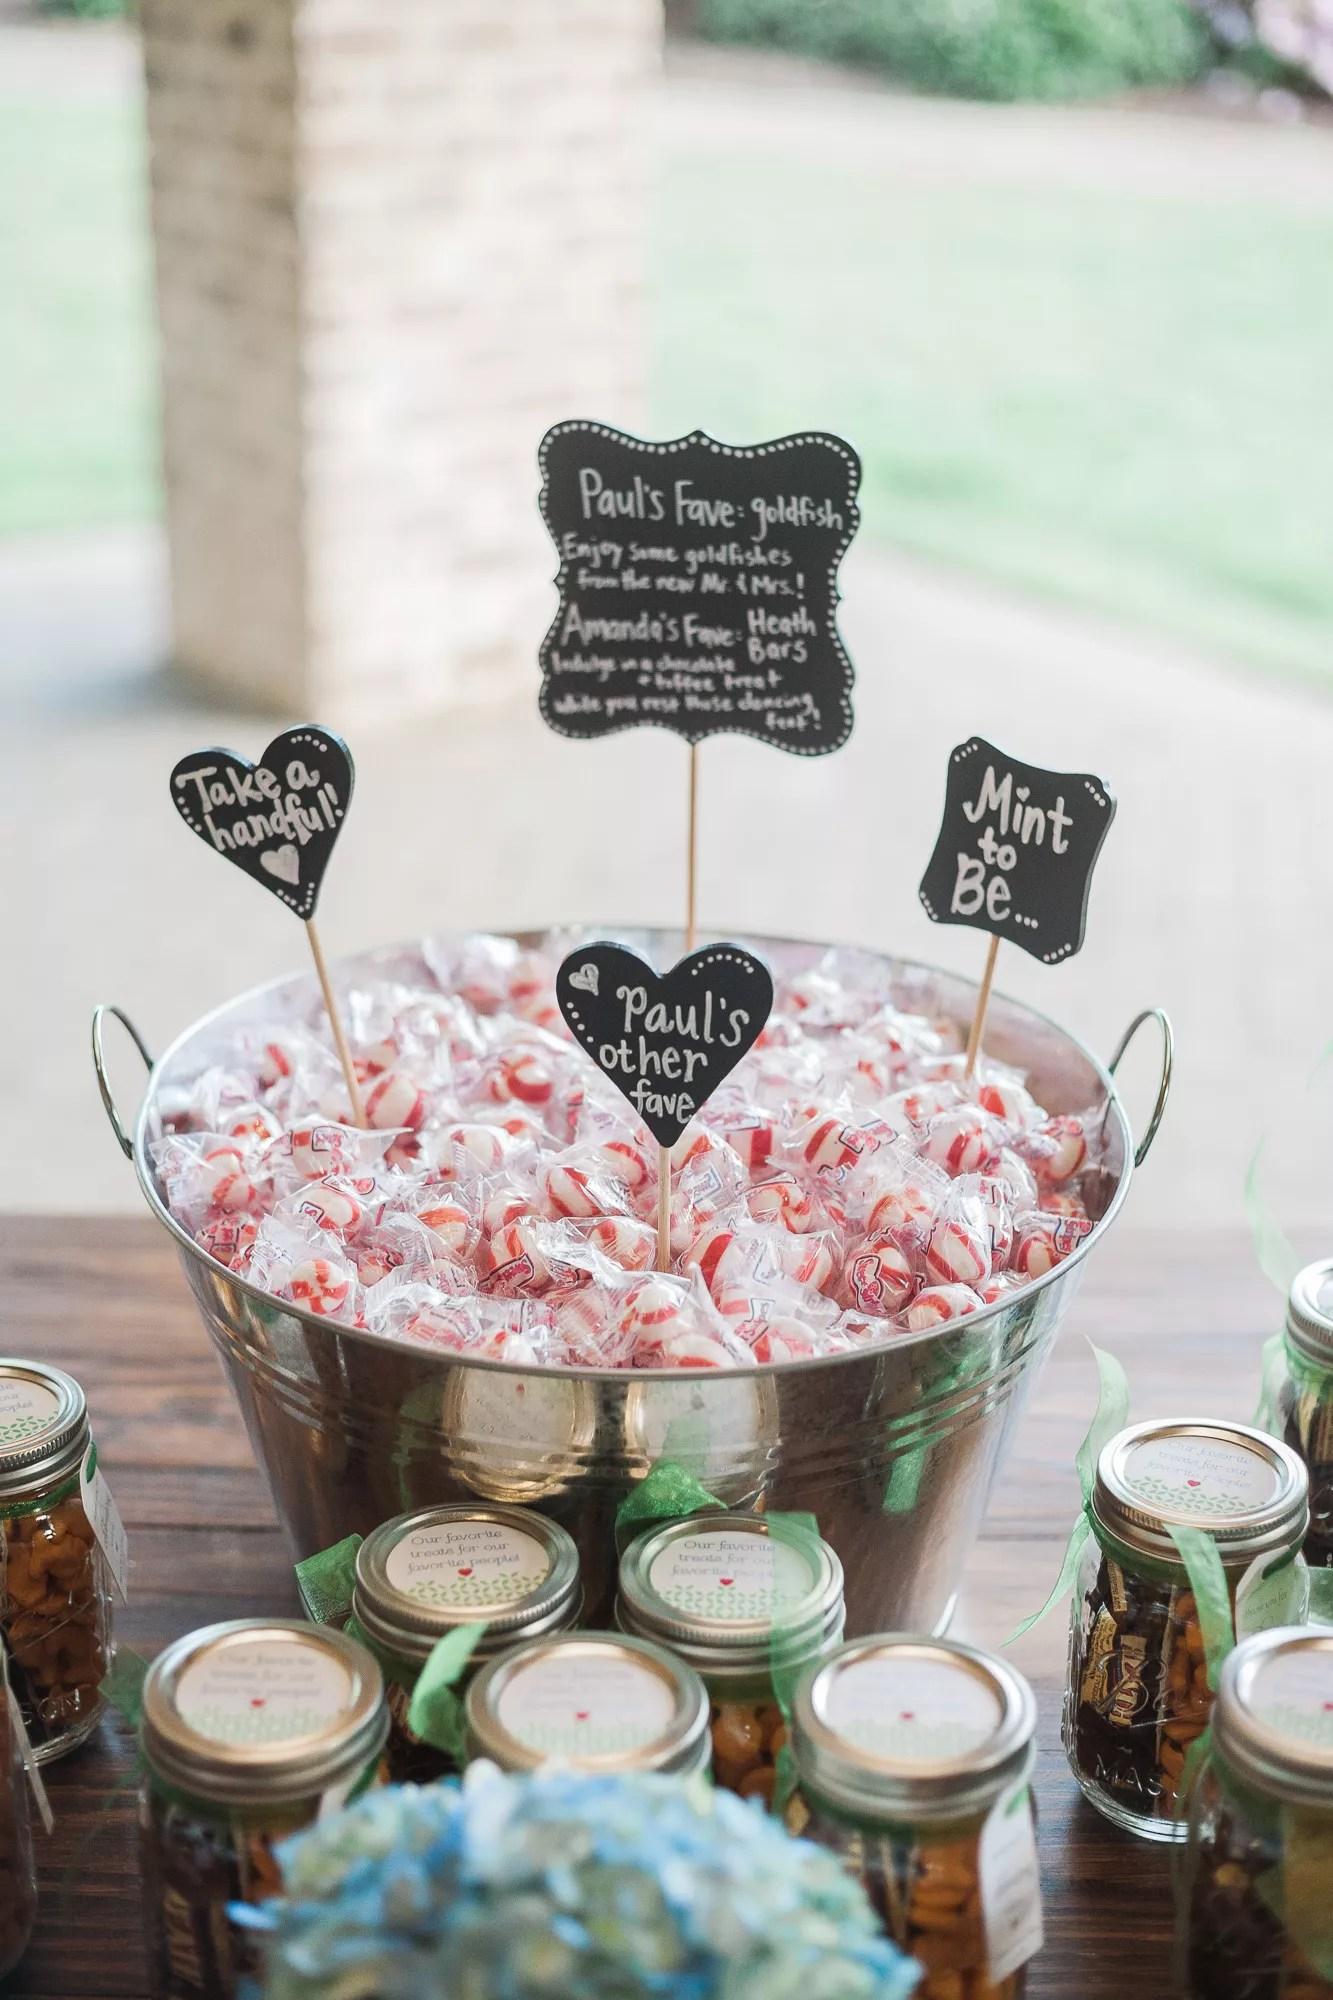 chalkboard wedding gifts favors photos wedding gifts for guests Mint Wedding Favors With DIY Chalkboard Signs